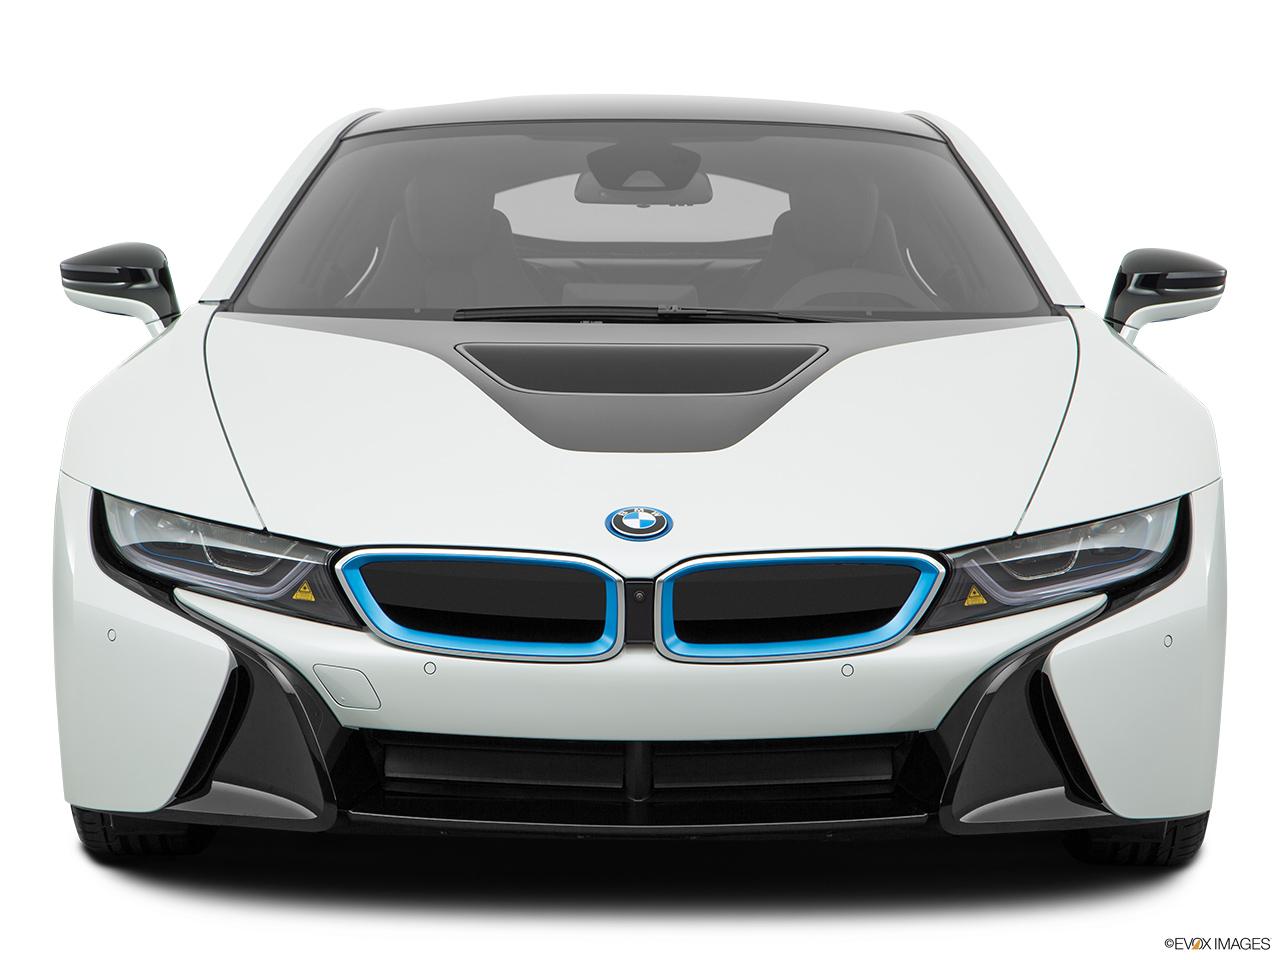 Car Pictures List For Bmw I8 2017 Plug In Hybrid Uae